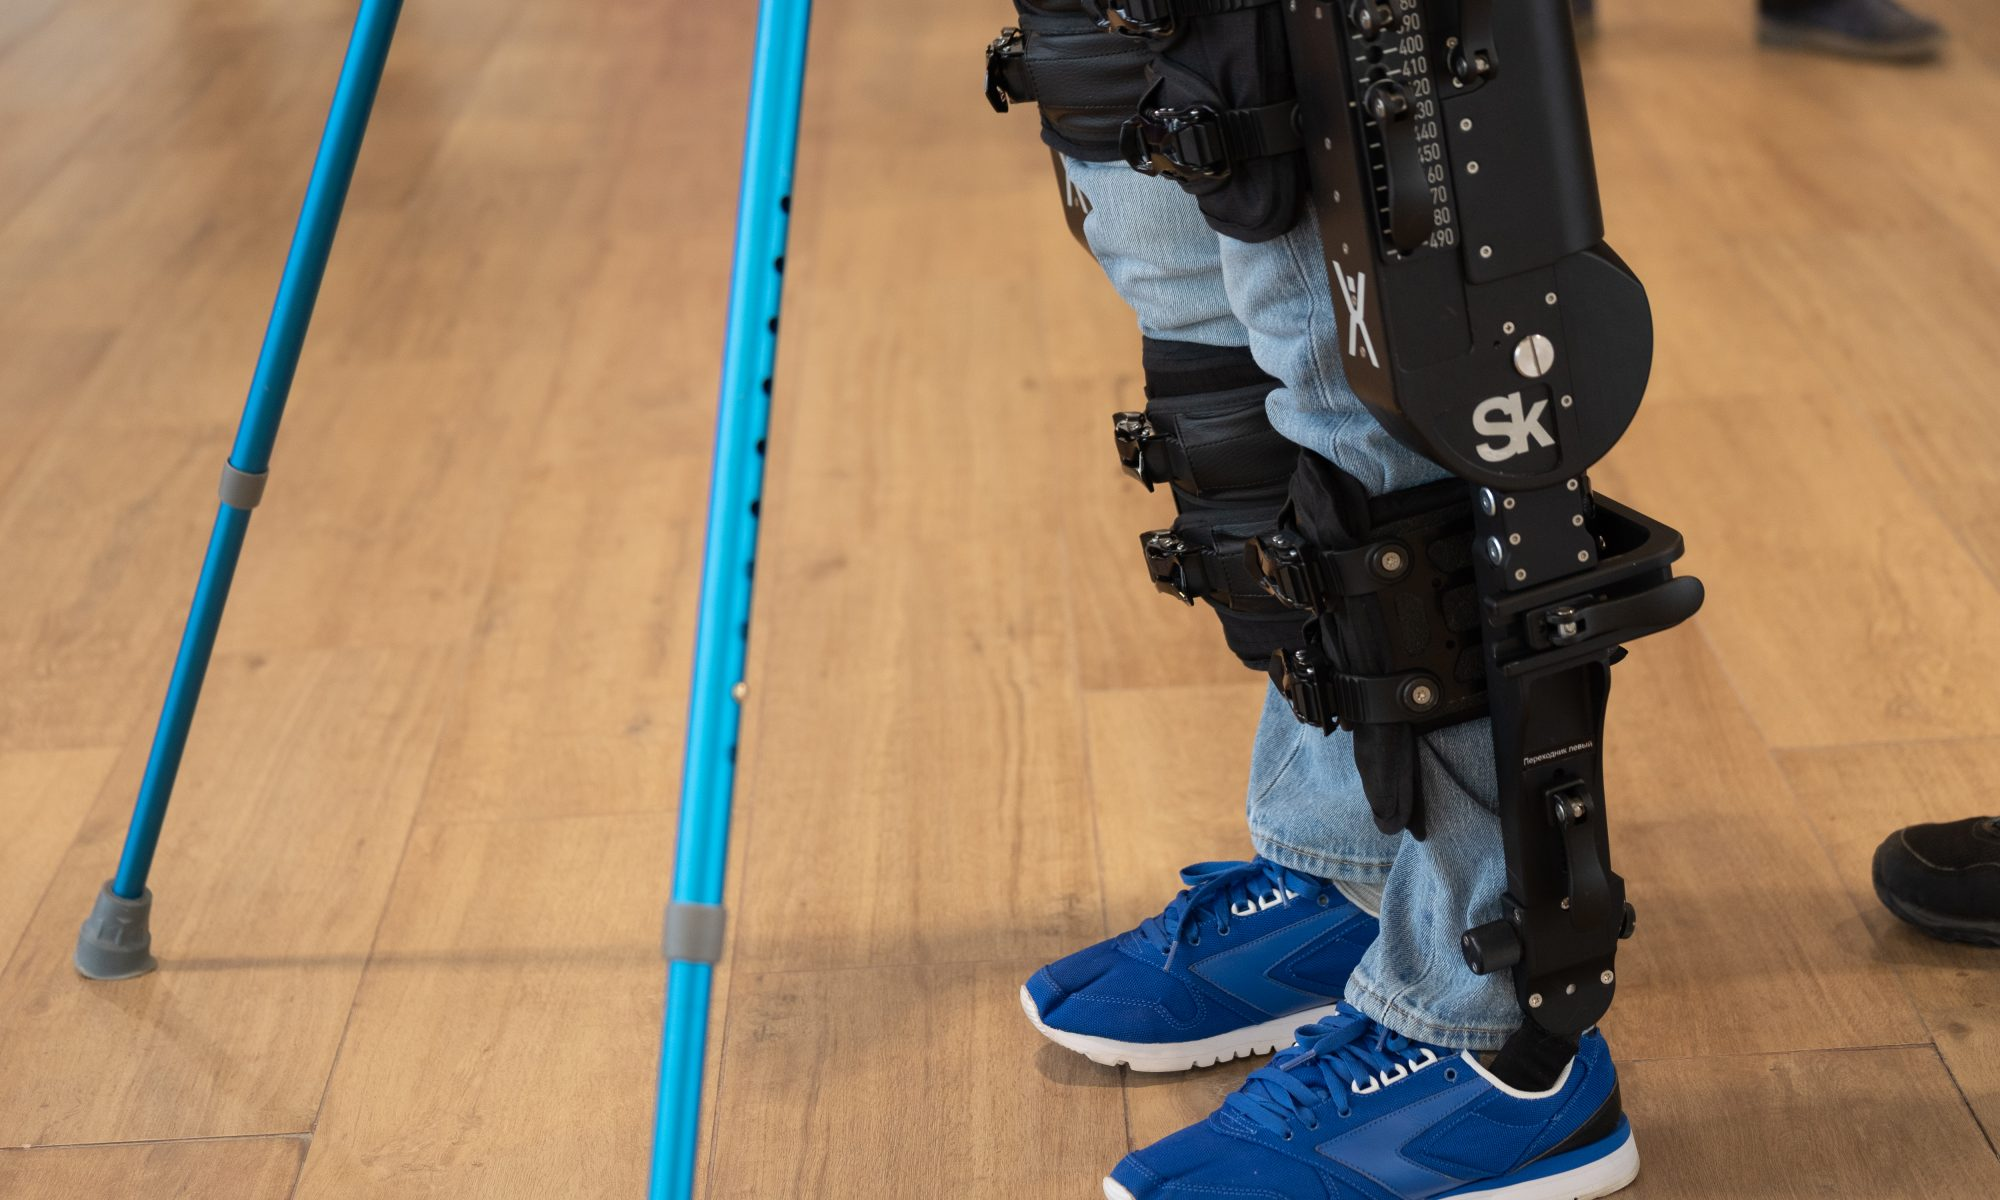 Exoskeleton for assisted walking